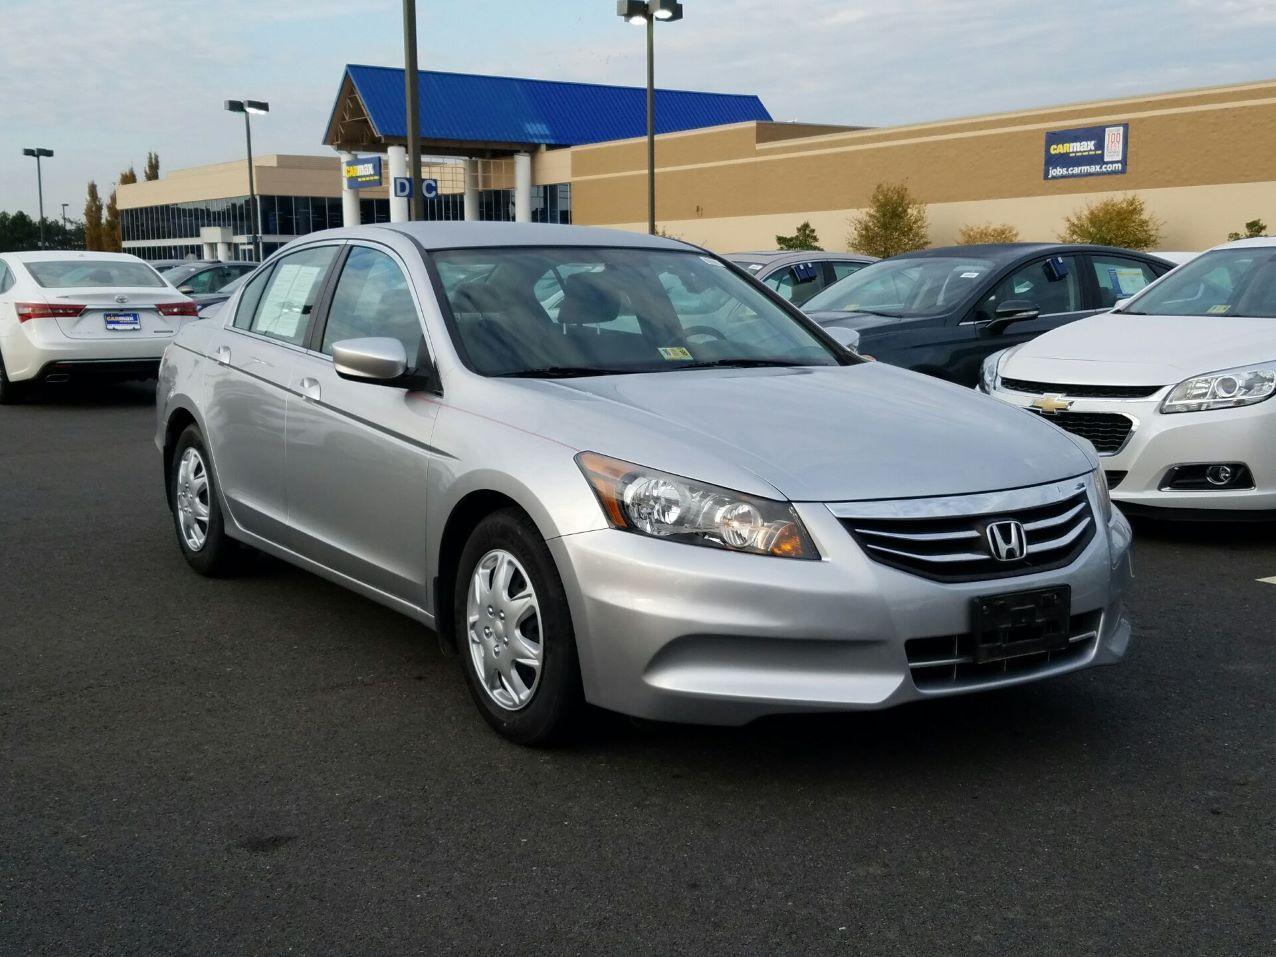 Used 2012 Honda Accord In Sterling Virginia Carmax Vehicles I